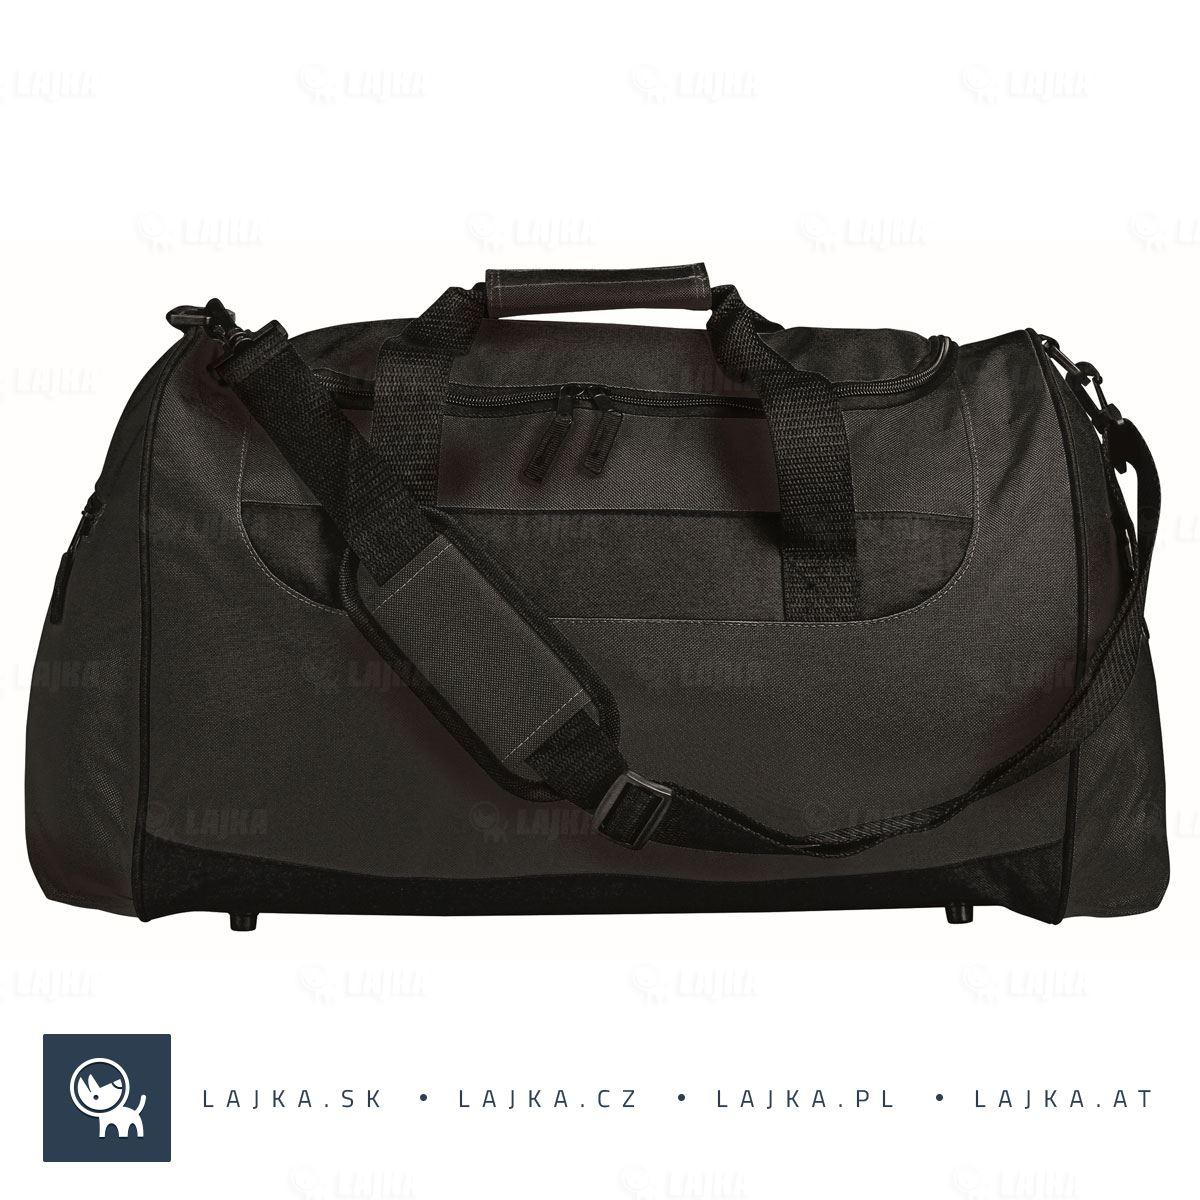 bd6e2f8b5e Cestovná taška Sennet